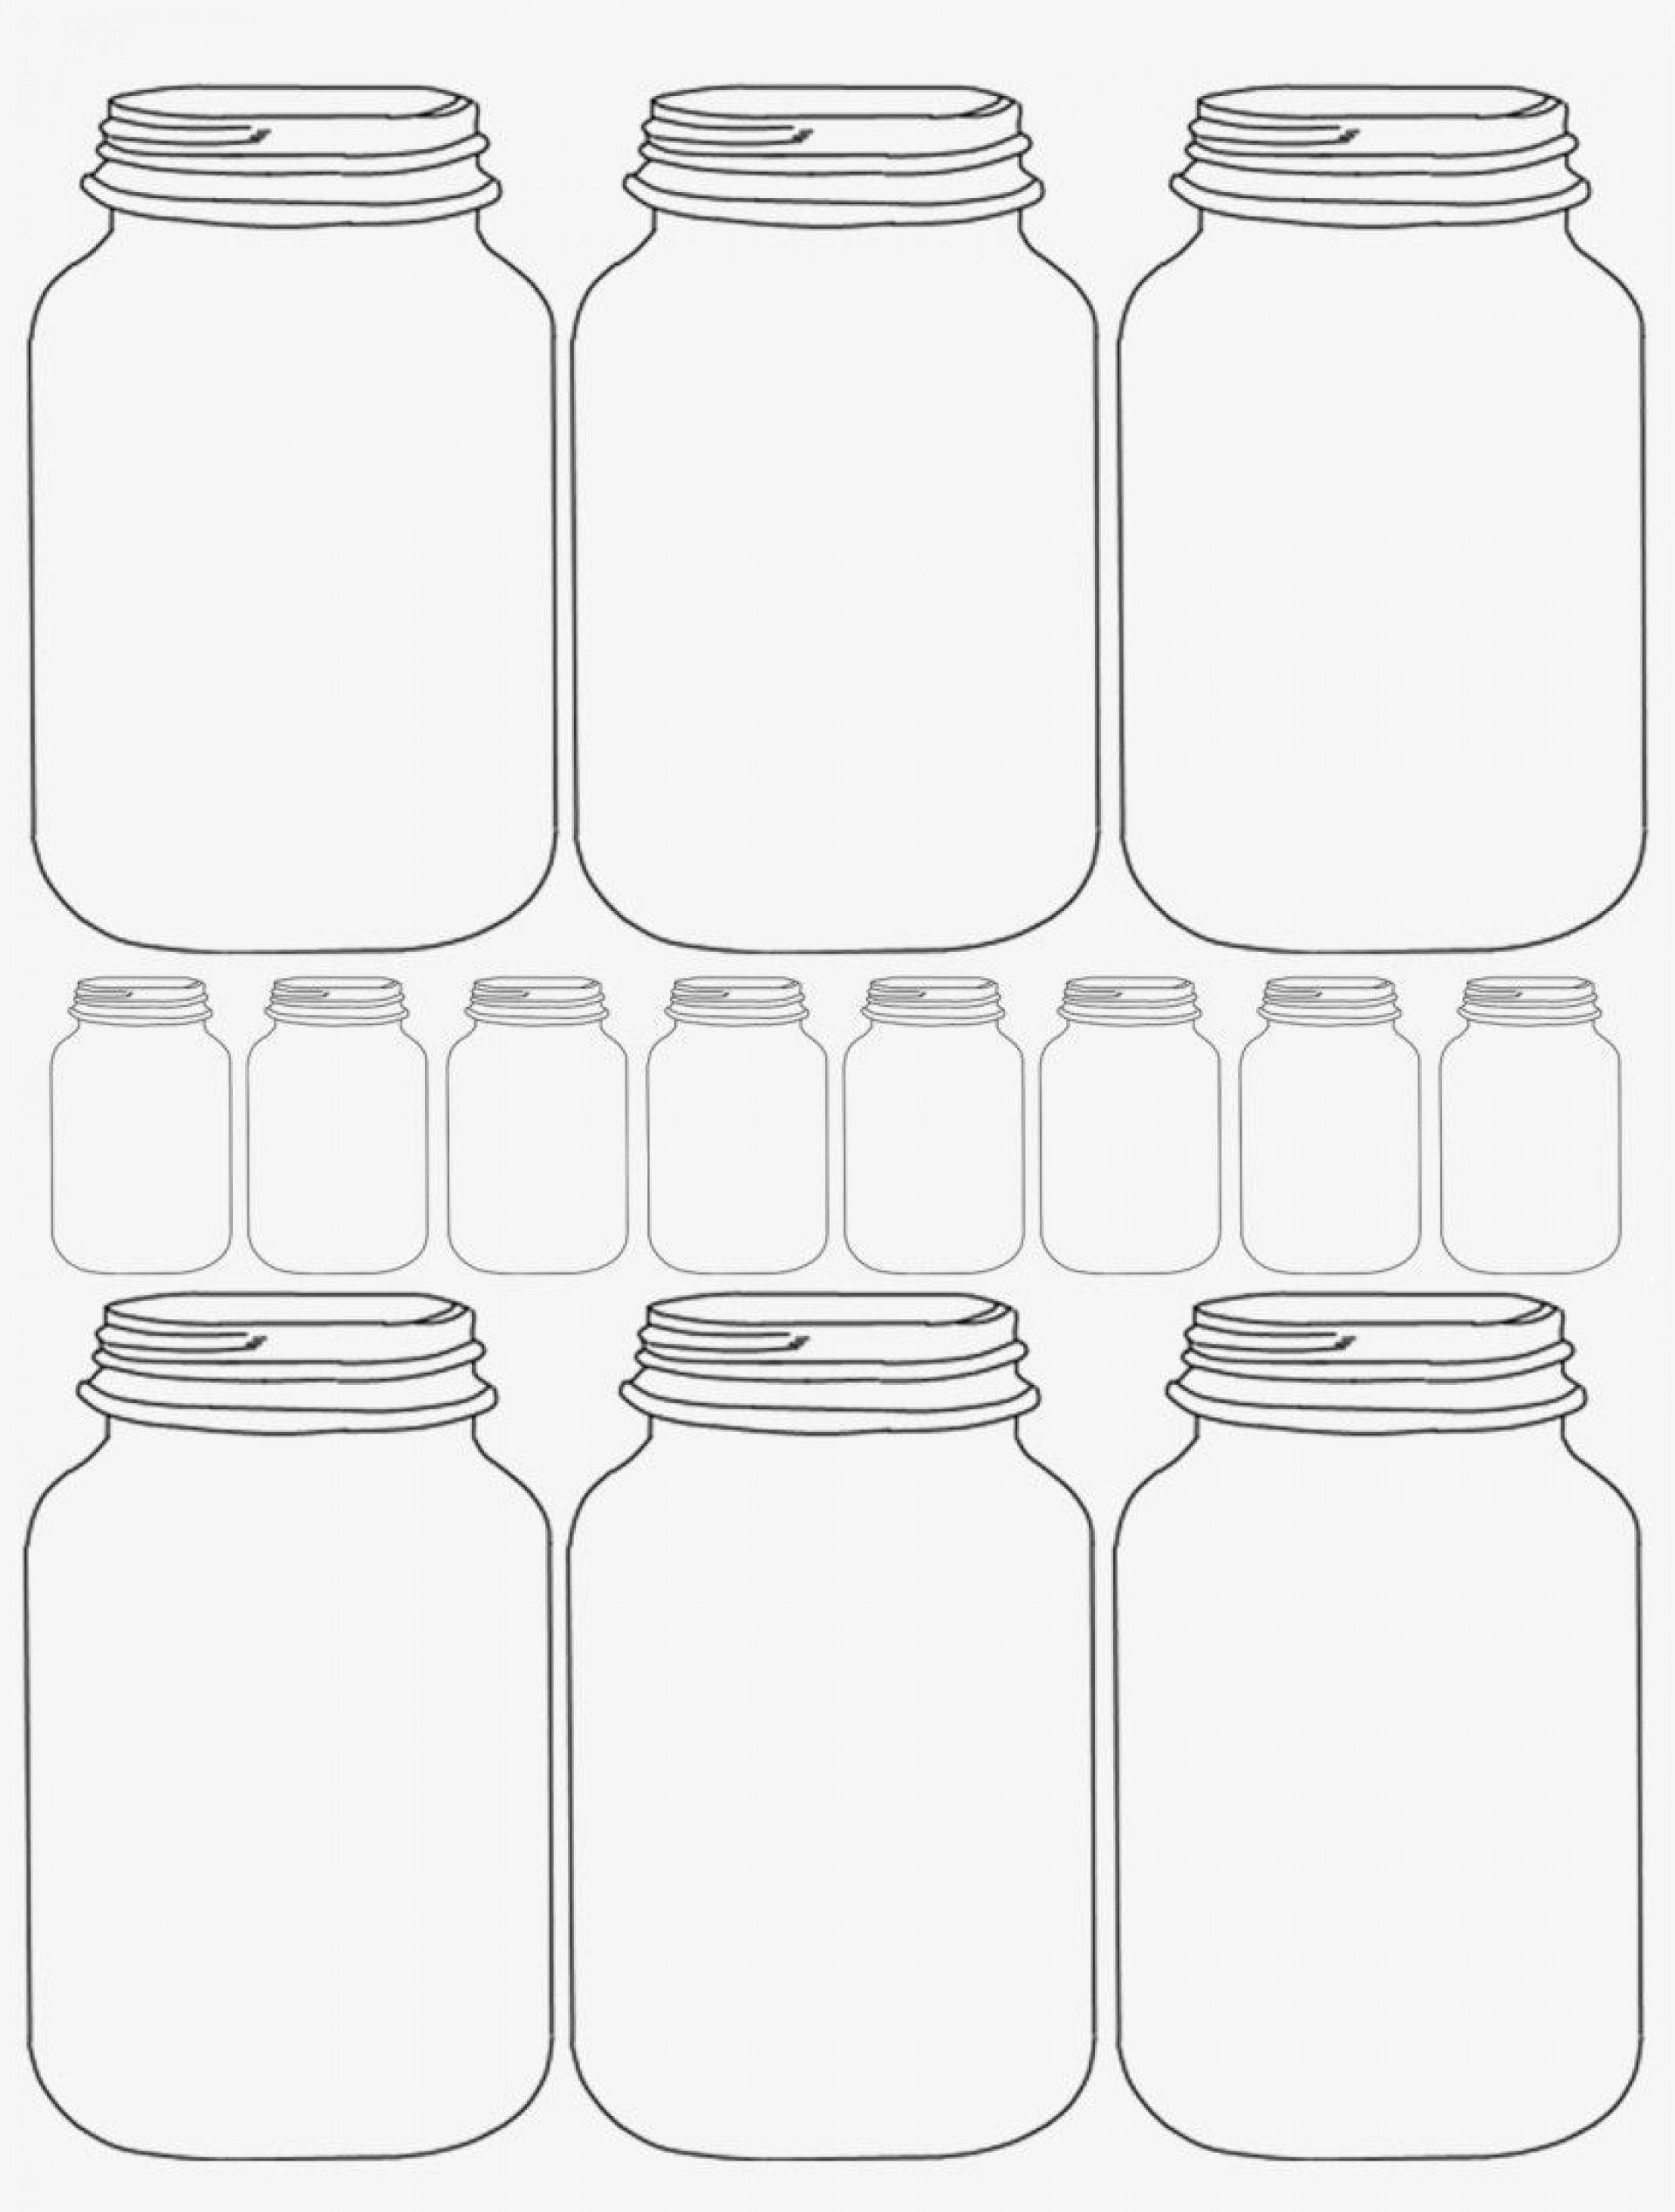 009 Striking Mason Jar Invitation Template High Def  Free Wedding Shower Rustic1920